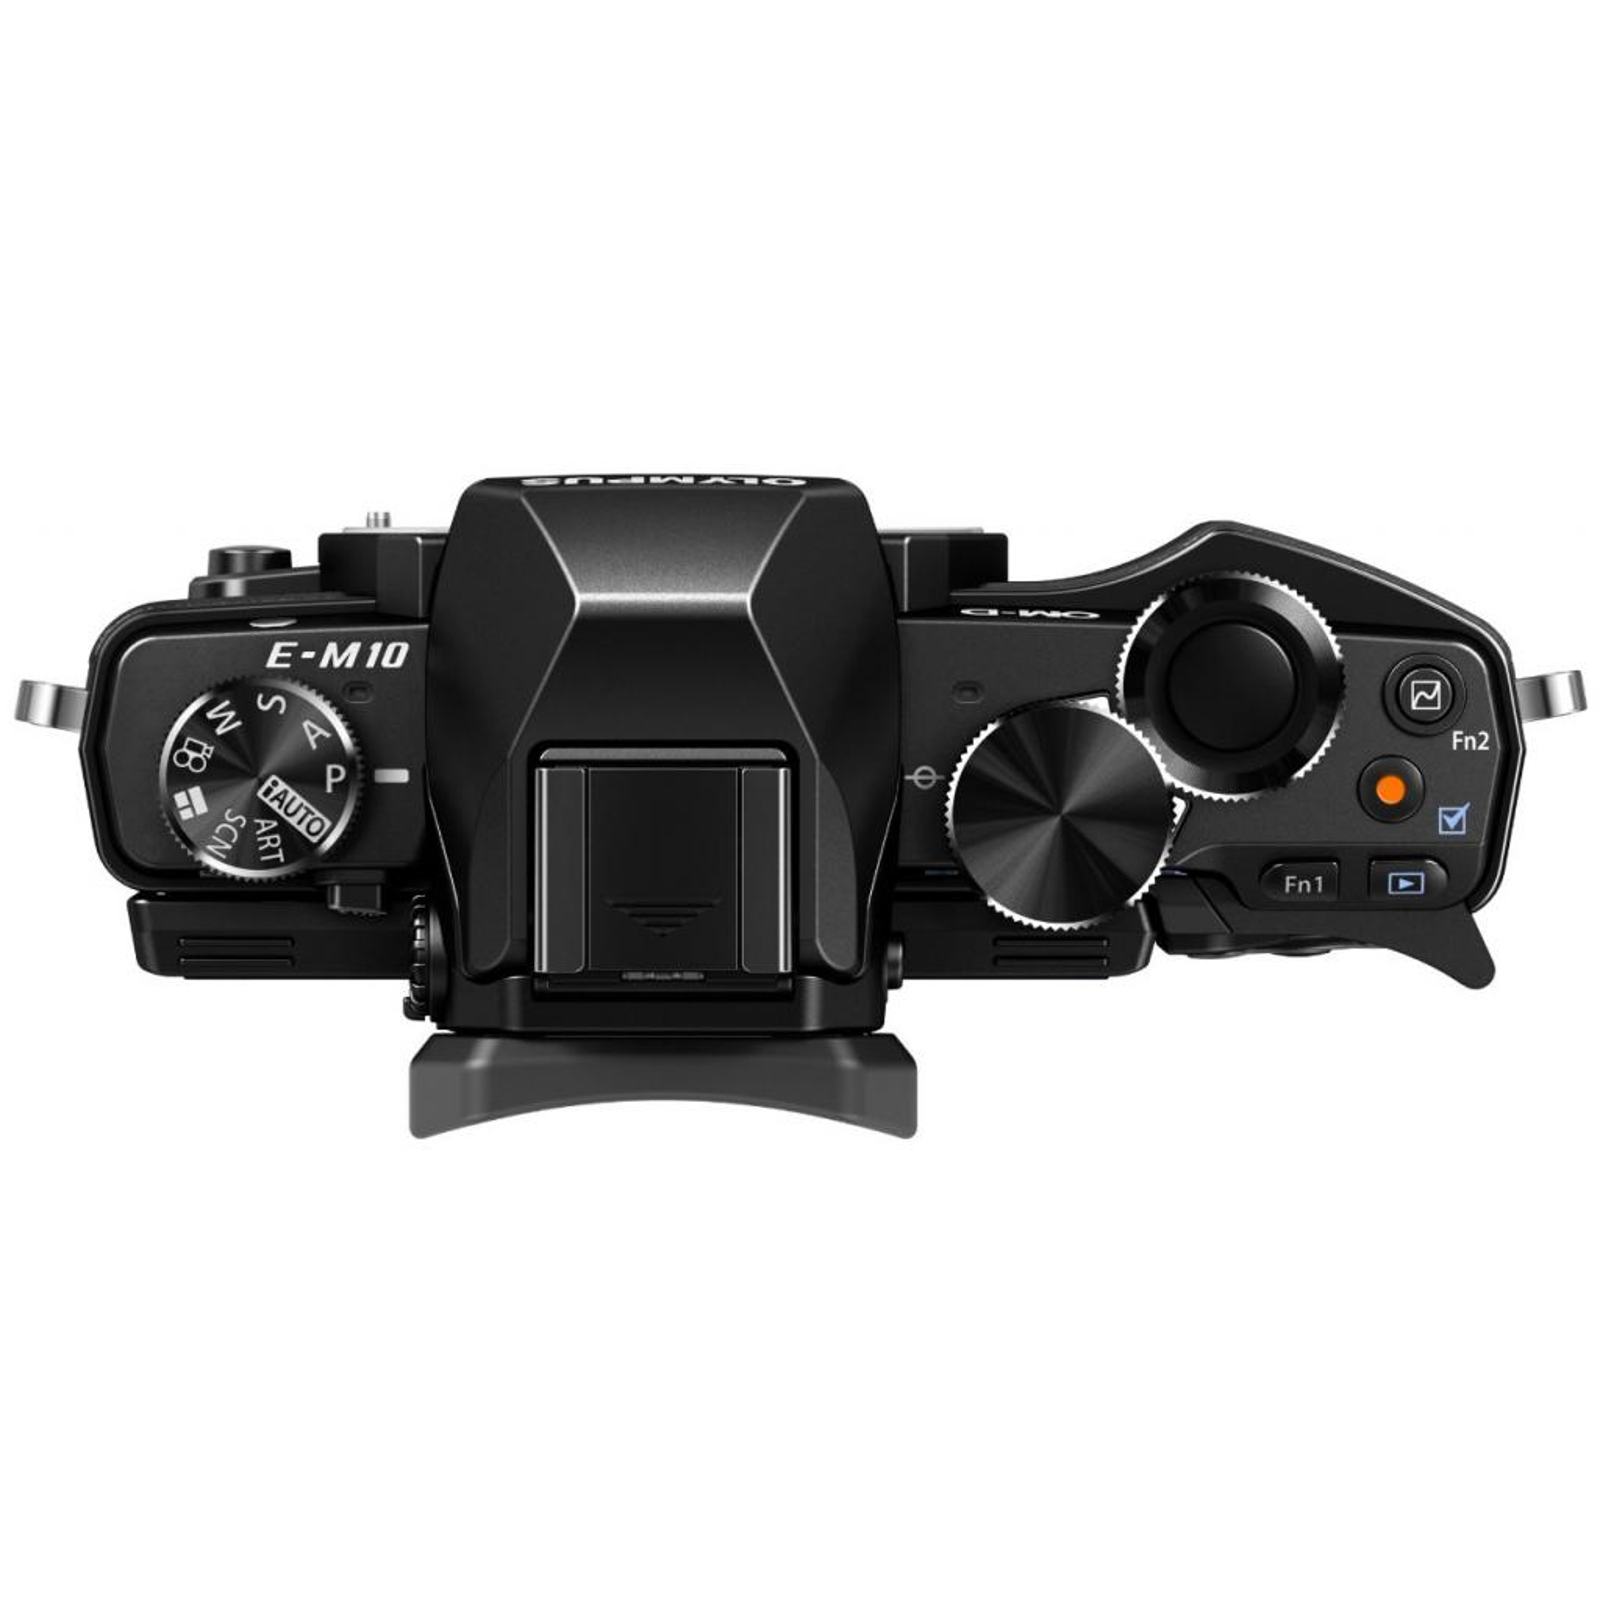 Цифровой фотоаппарат OLYMPUS E-M10 14-42 Kit black/black (V207021BE000) изображение 4